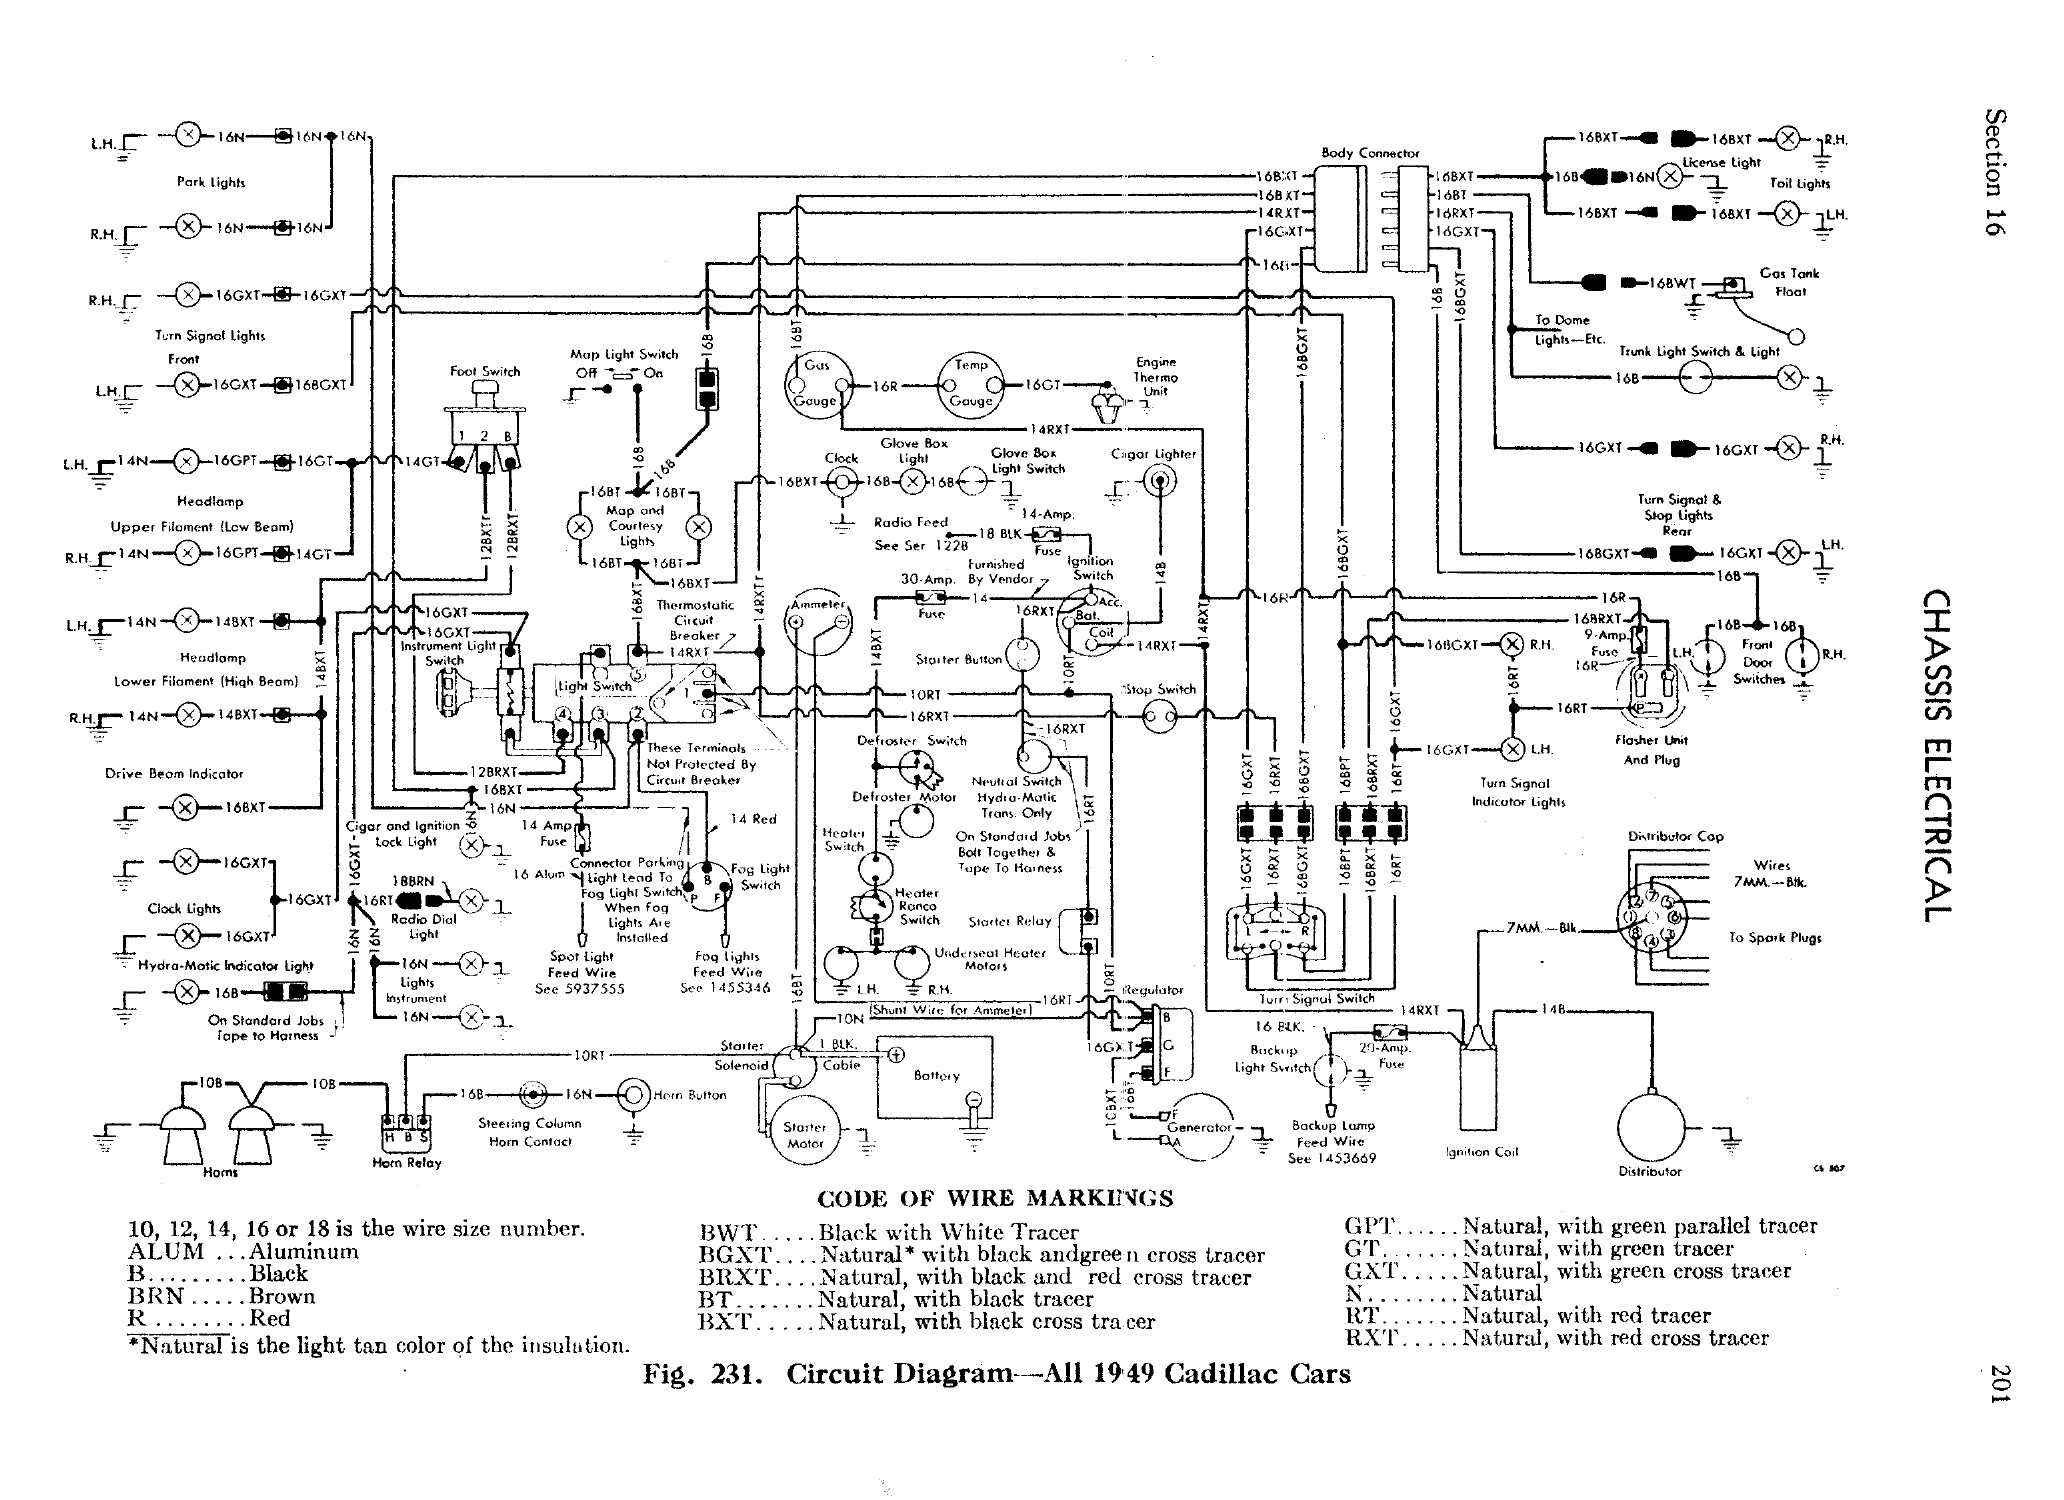 Ab Wiring Cadillac - Wiring Diagram Networks